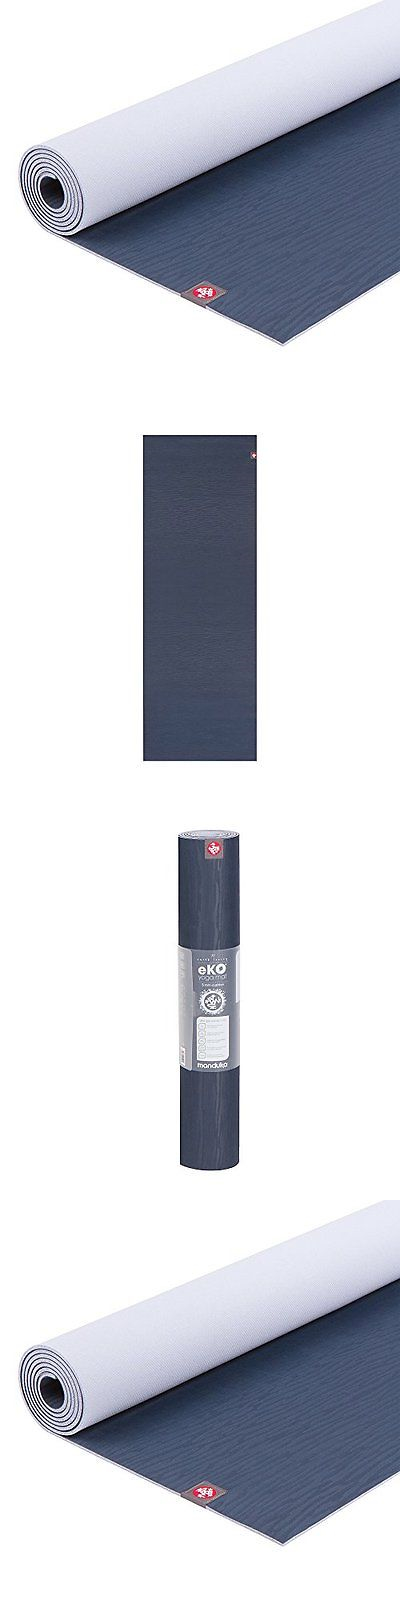 Mats and Non-Slip Towels 158928: Manduka Eko 5Mm Natural Rubber Wet-Grip Yoga Mat -> BUY IT NOW ONLY: $86.48 on eBay!